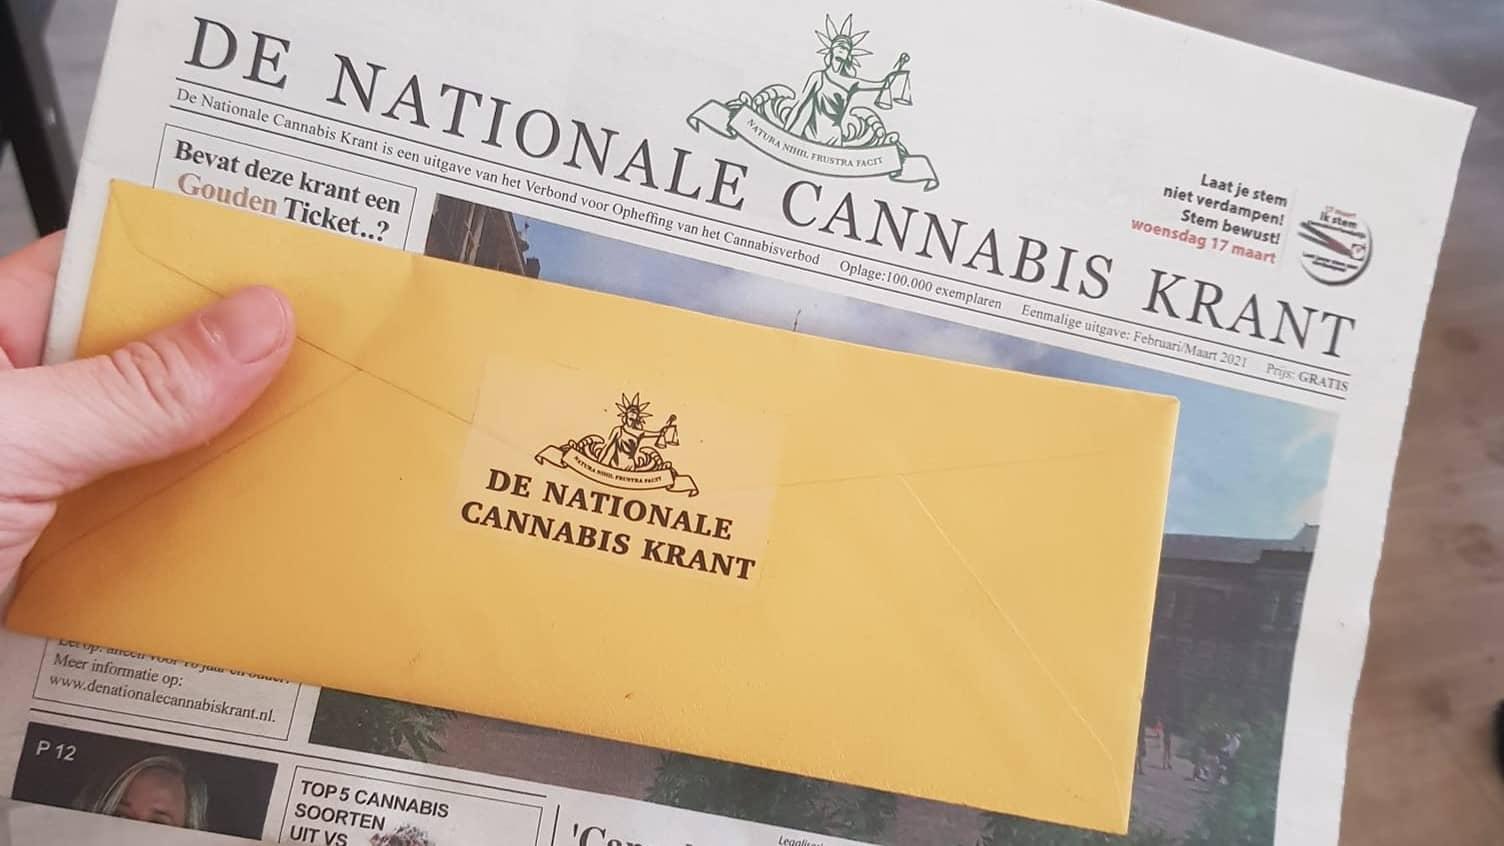 Gouden Ticket De Nationale Cannabis Krant